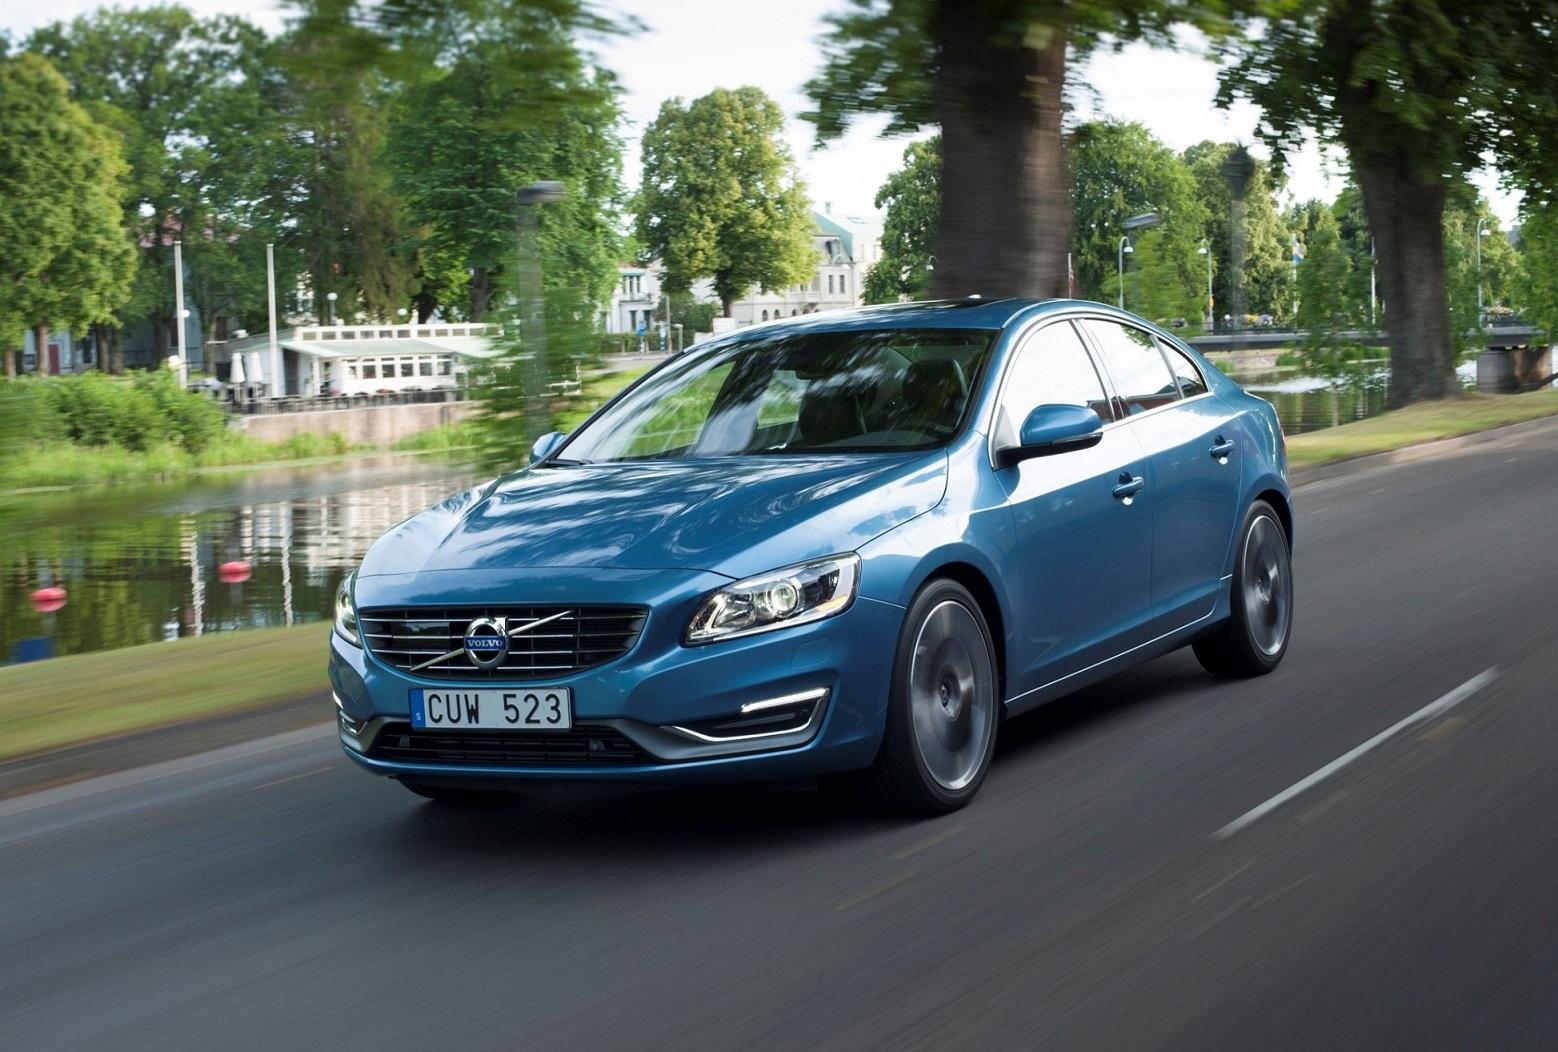 VOLVO2BS602BT32B1.52BAUTO 2 Εγγυημένο και ενισχυμένο όφελος απόσυρσης από τη Volvo Sales, Volvo, προσφορές